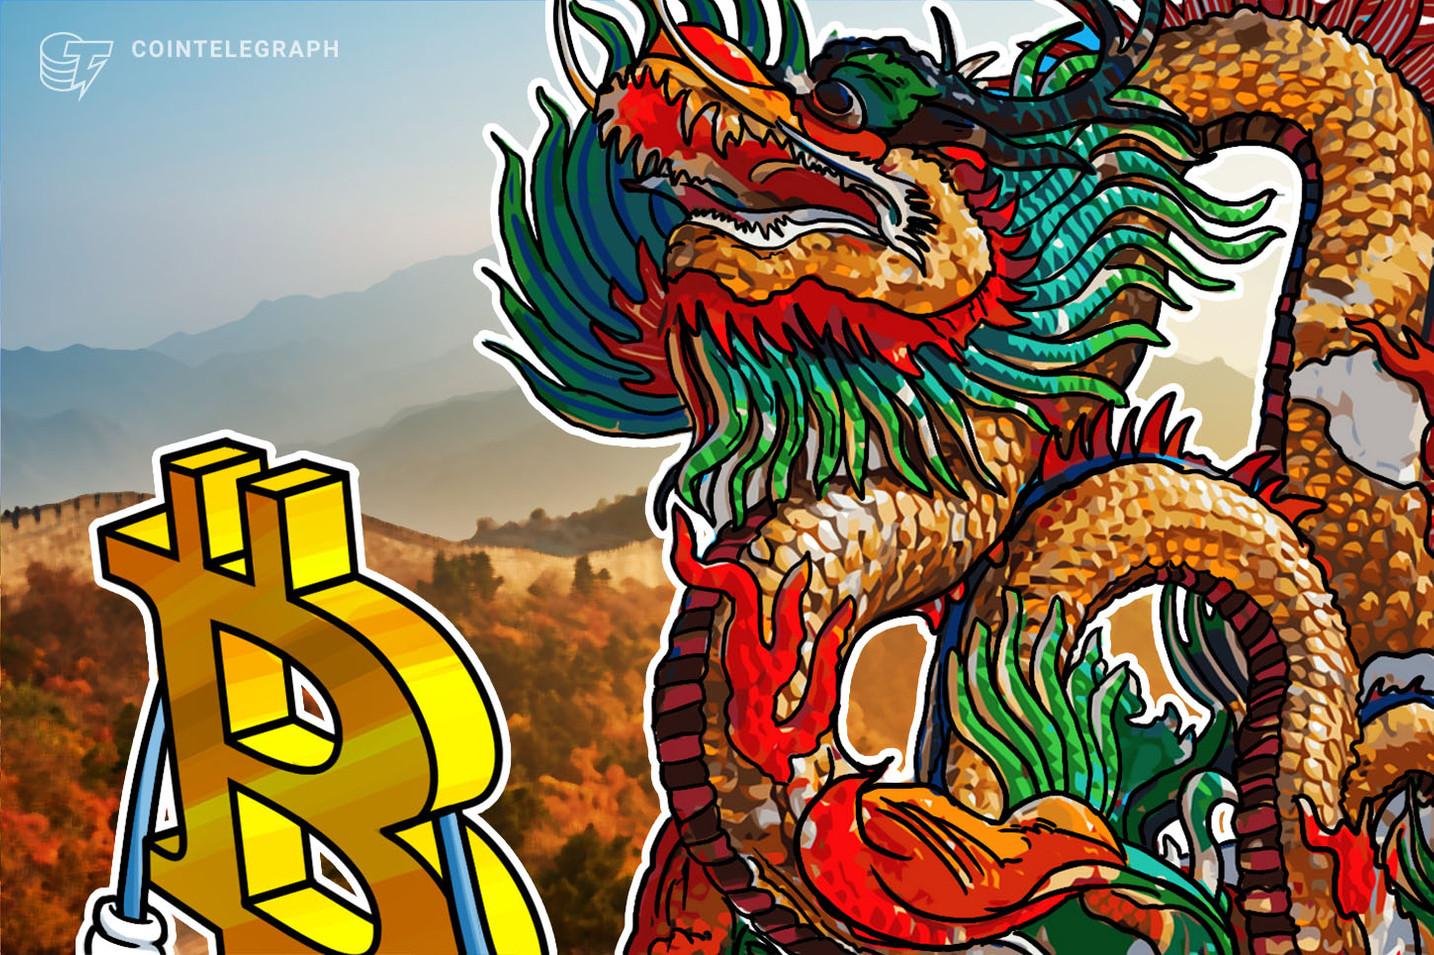 Blockchain, not Bitcoin: China's BTC Volume on LocalBitcoins Hits 2-Year Low